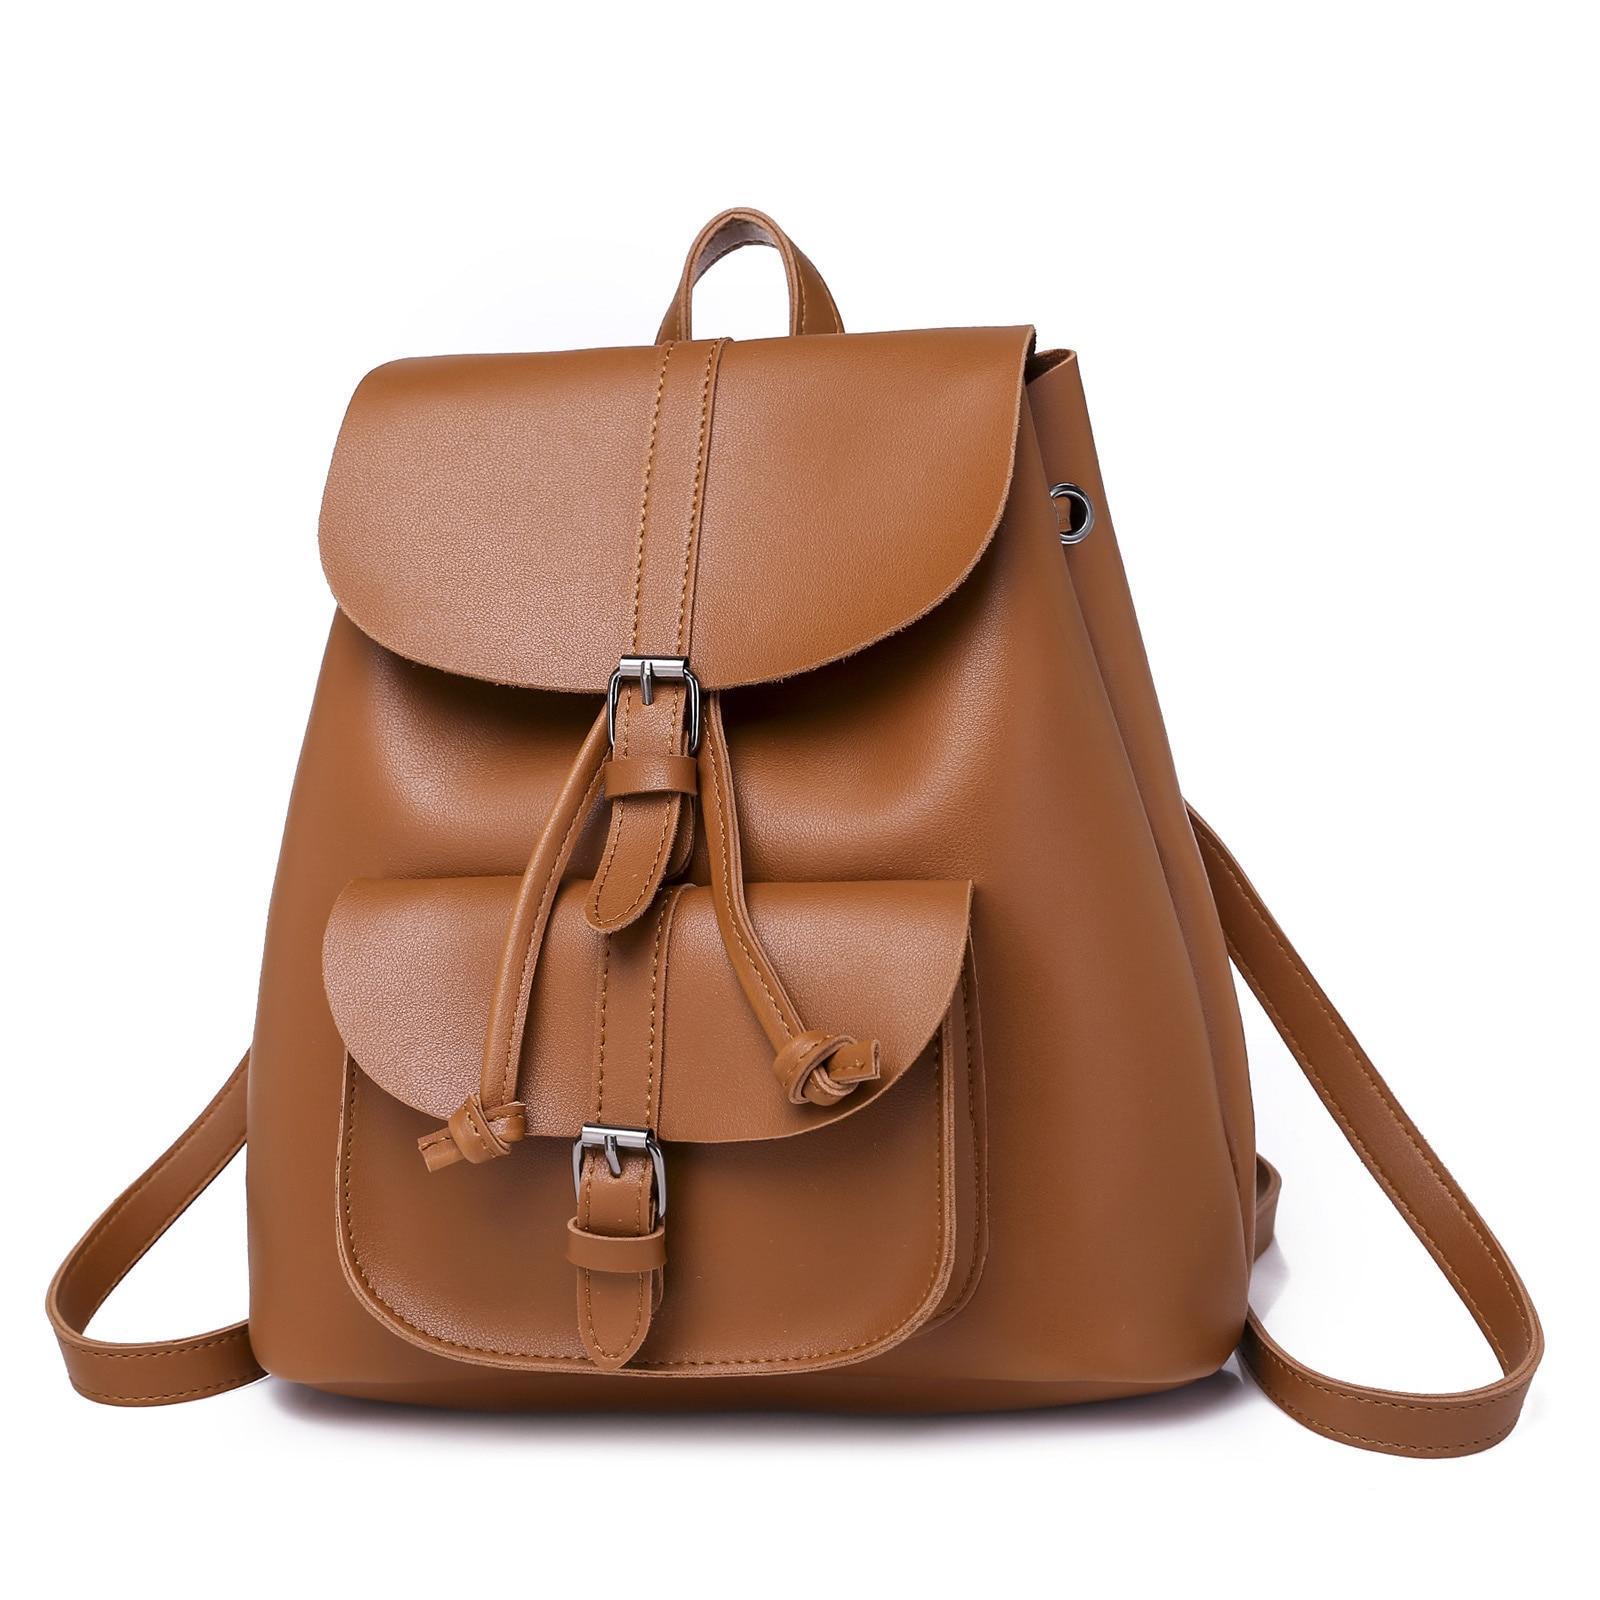 Backpack Women Pu Leather Female Backpacks Teenager School Mochila Feminina Rucksack Mochilas Mujer 2019